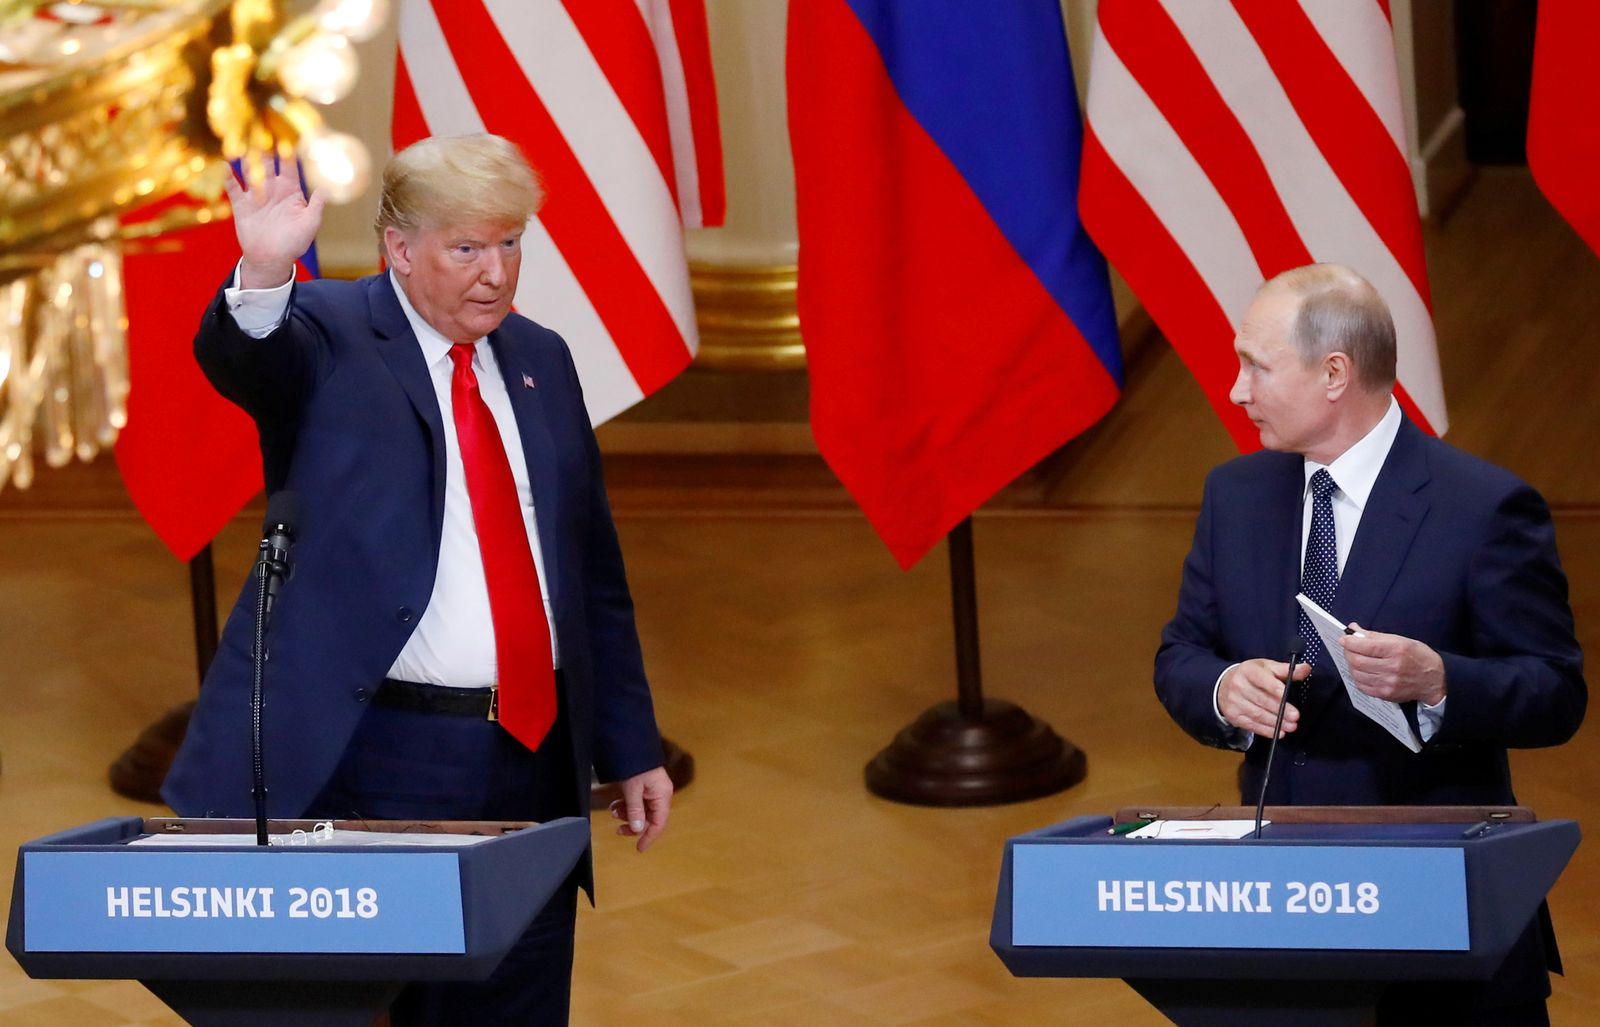 USA-RUSSIA/PUTIN